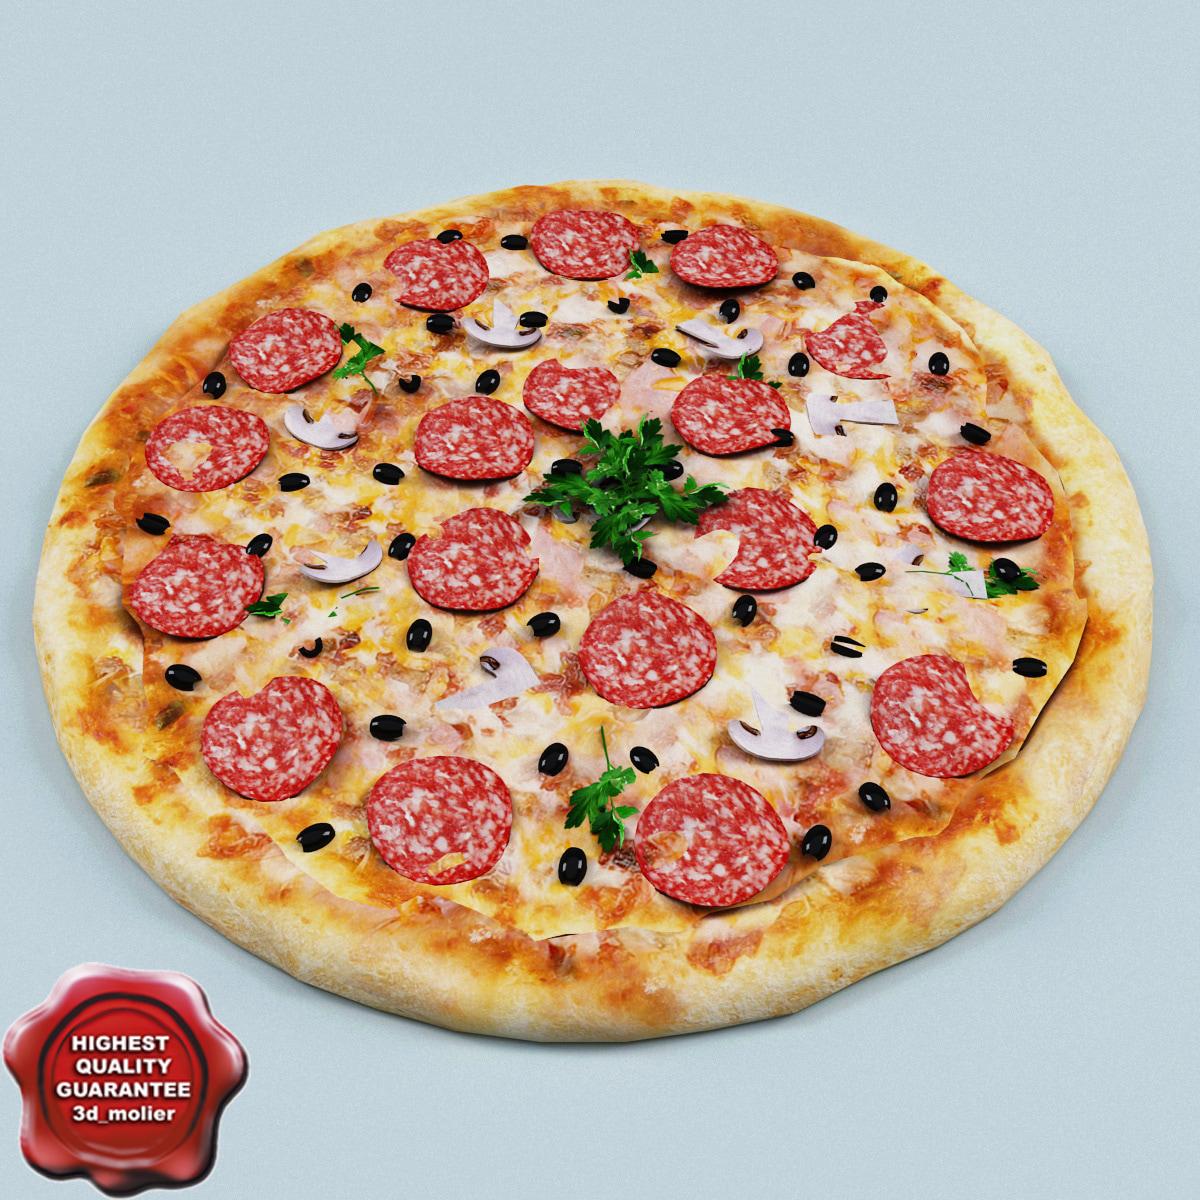 Pizza_V1_0.jpg